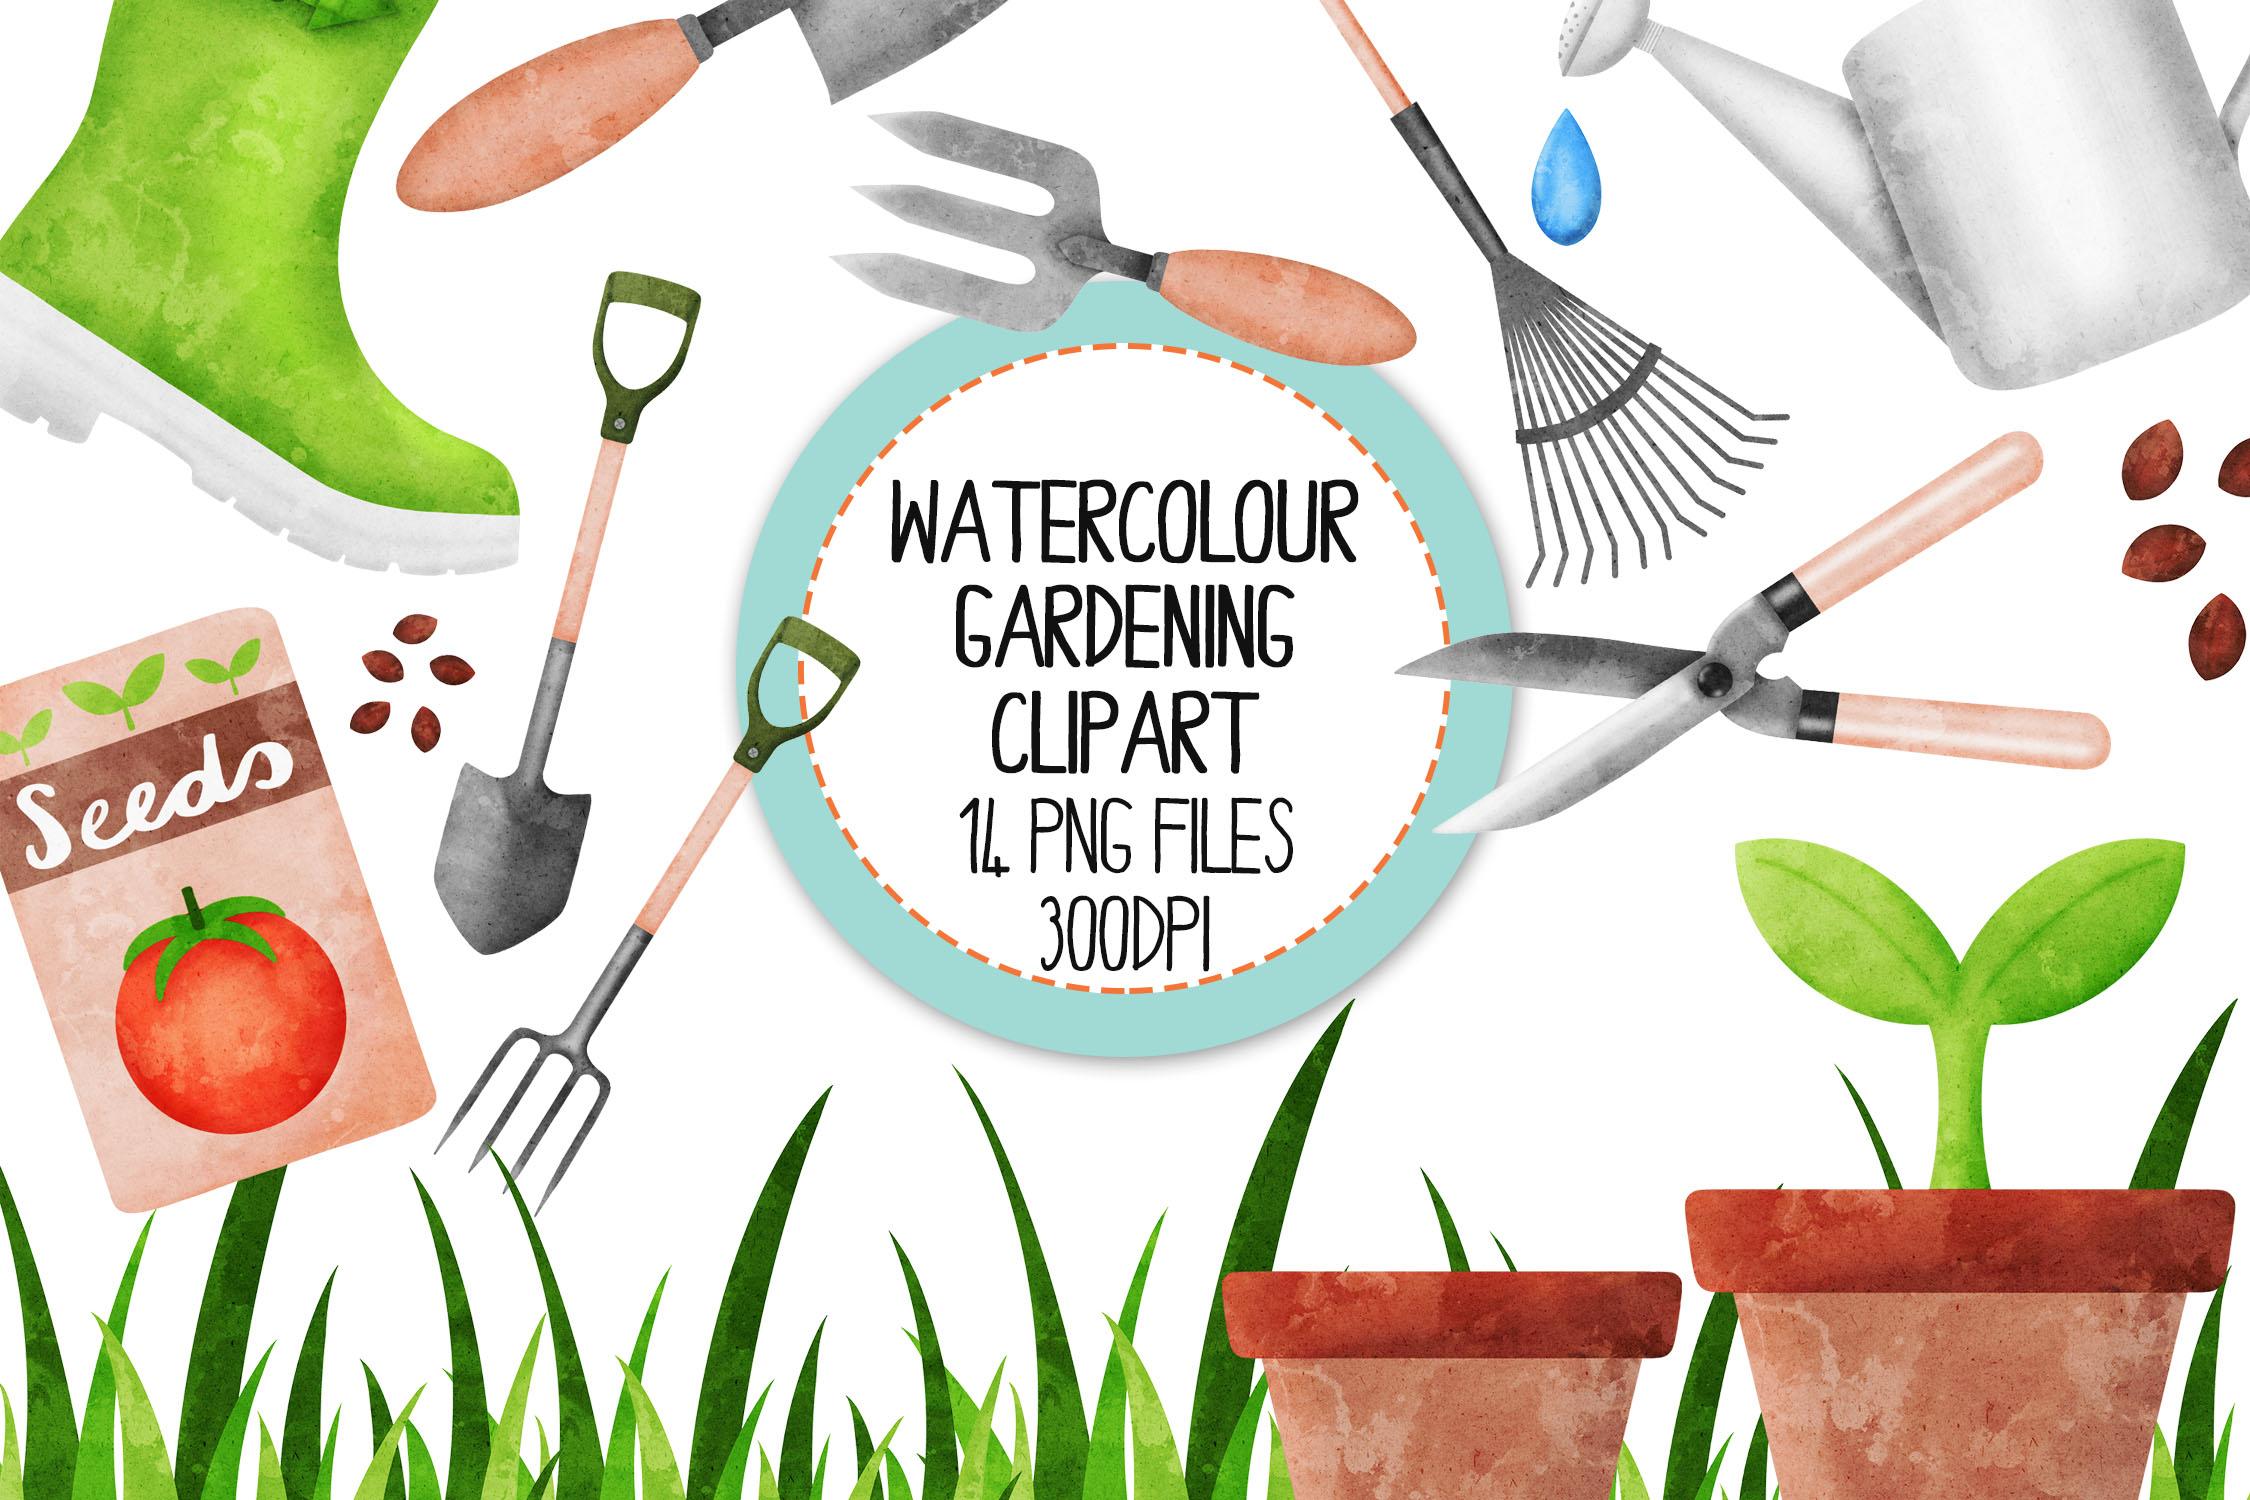 Watercolor Gardening Clip Art Set example image 1